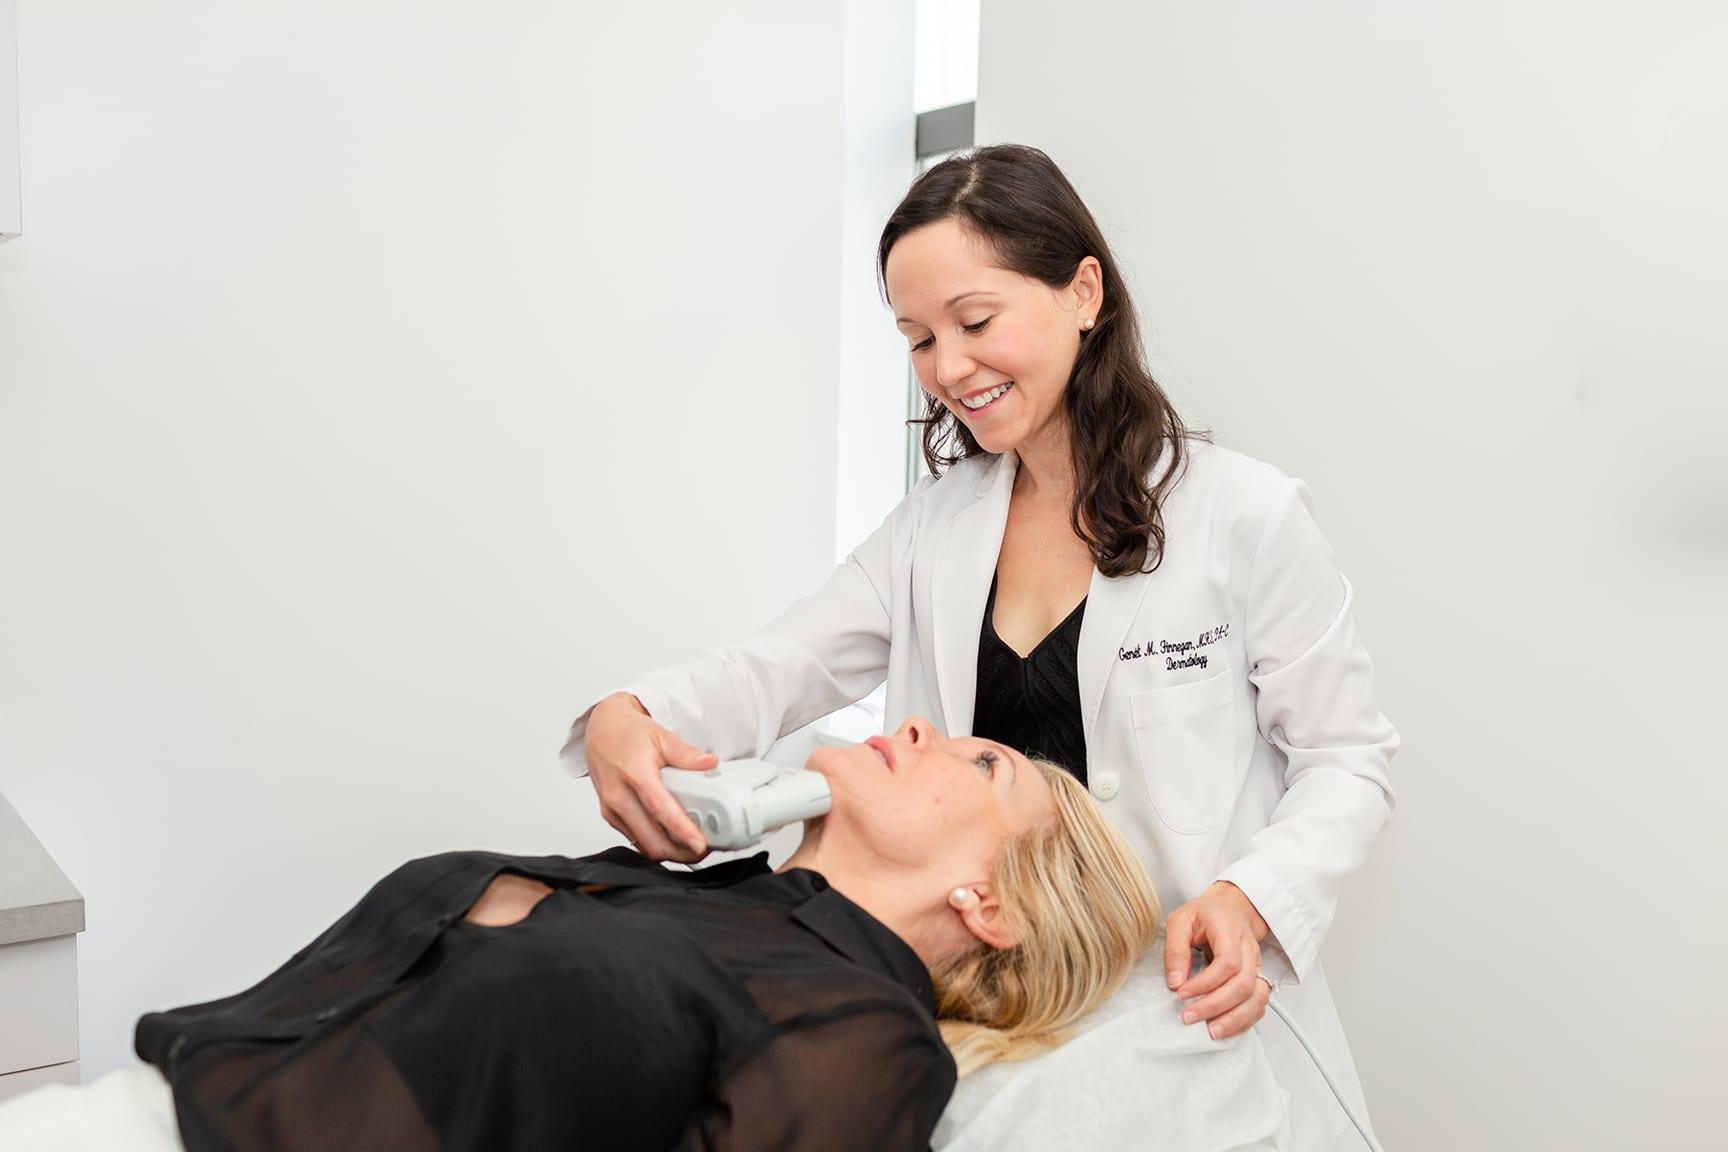 skin tightening treatment in new york city